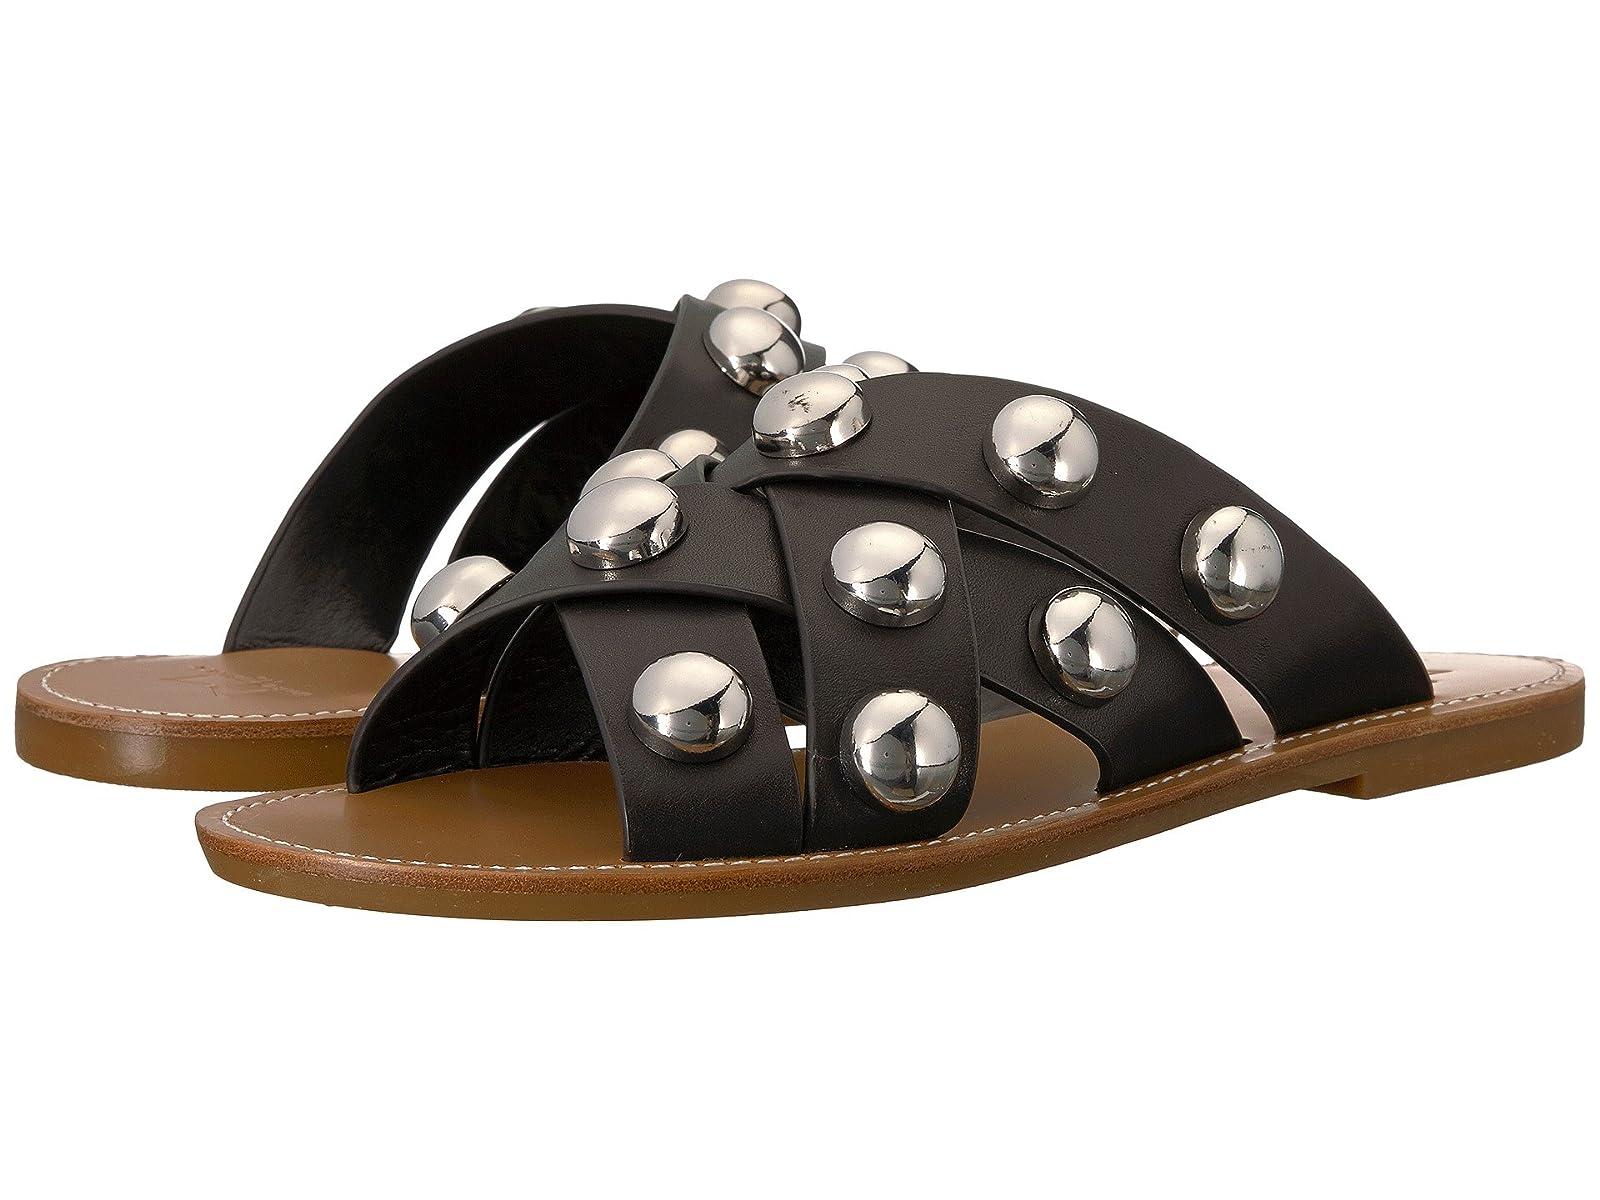 Marc Fisher LTD RaidanAtmospheric grades have affordable shoes